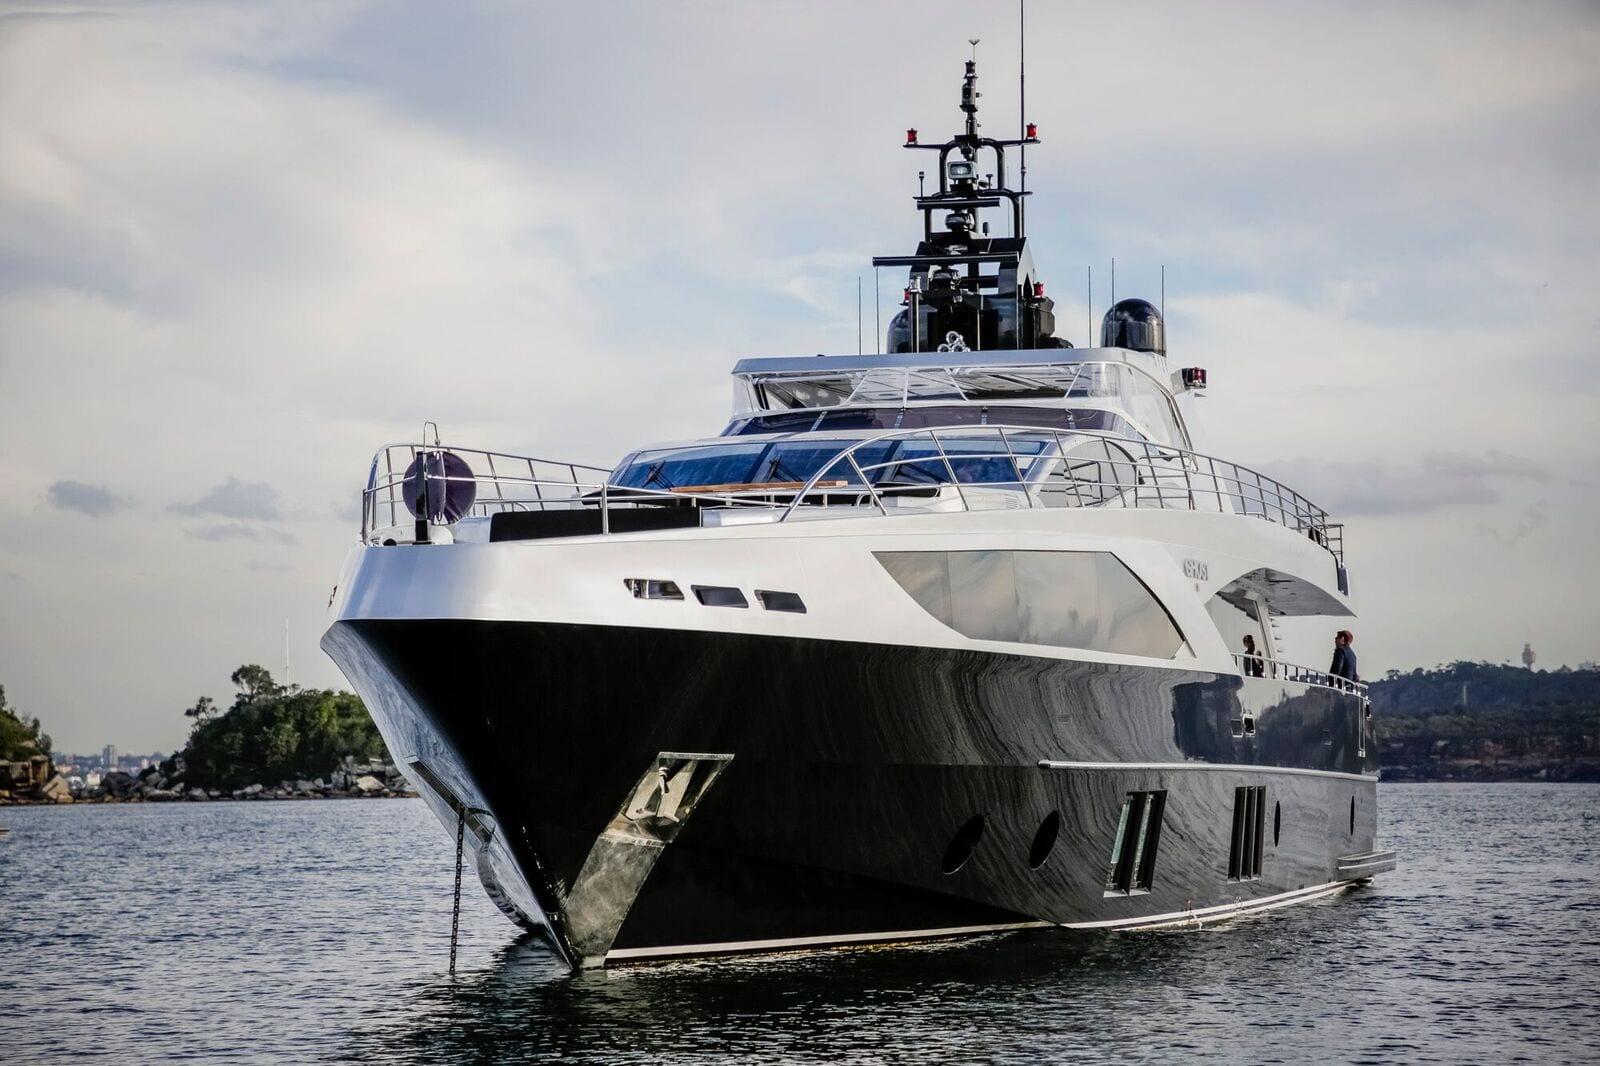 Sydney Harbour Charter & Boat Hires